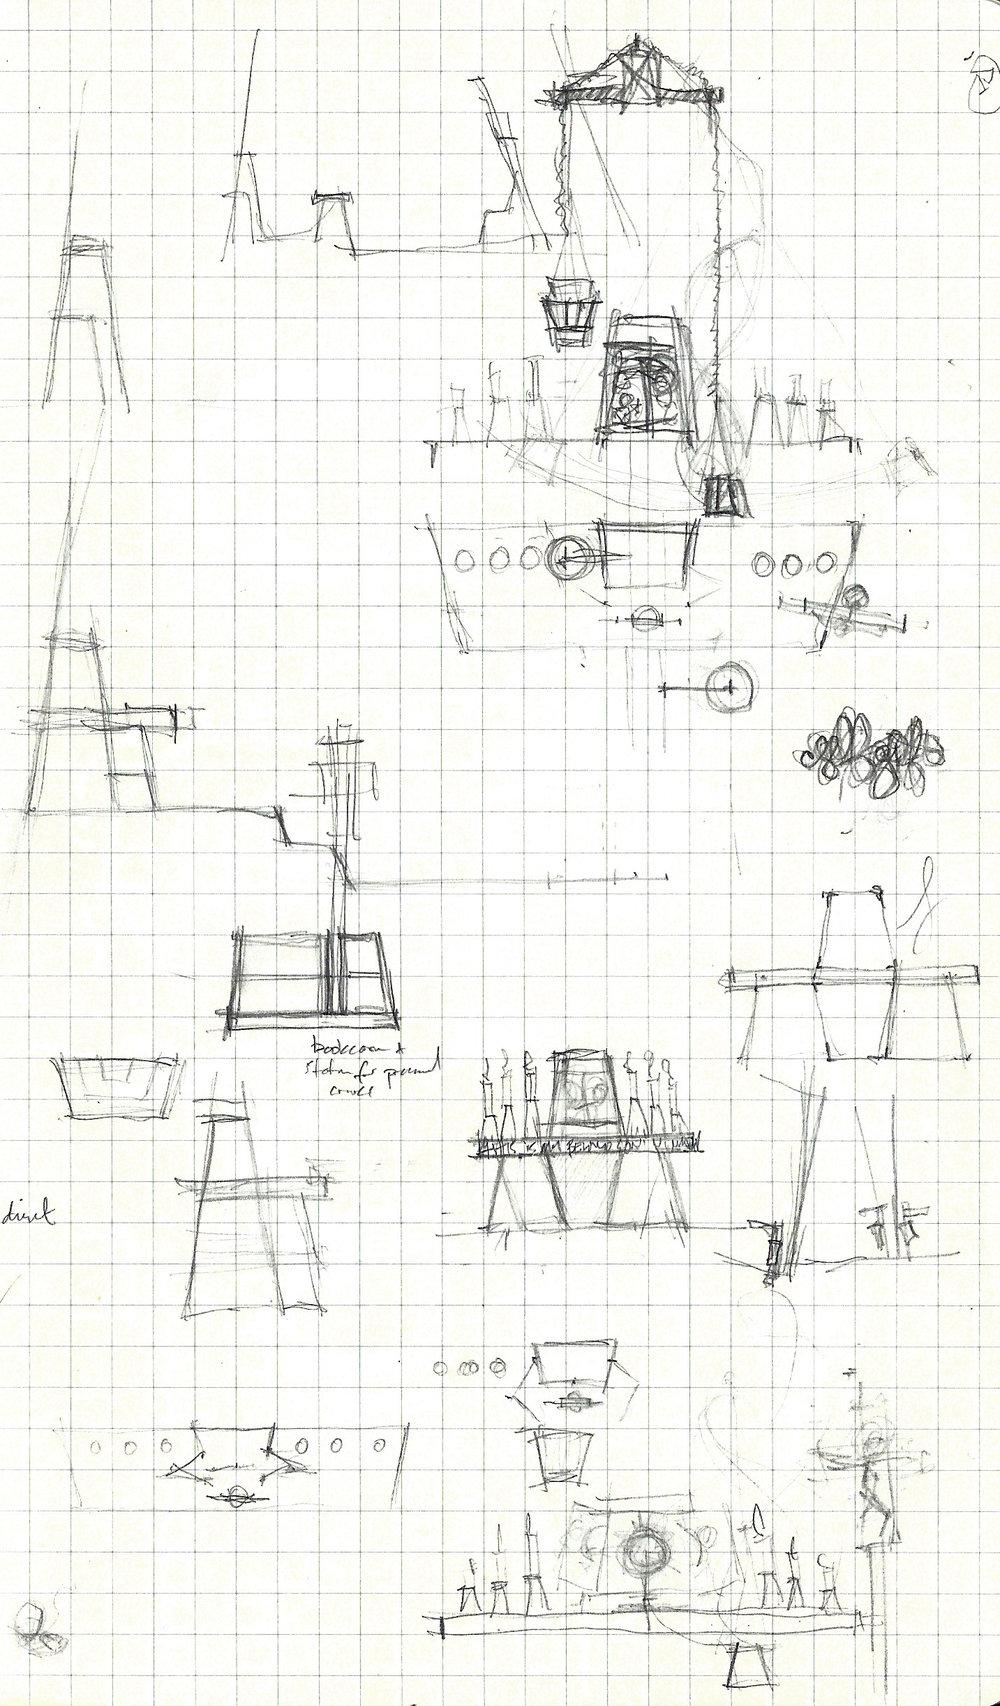 altar_sketches.jpg